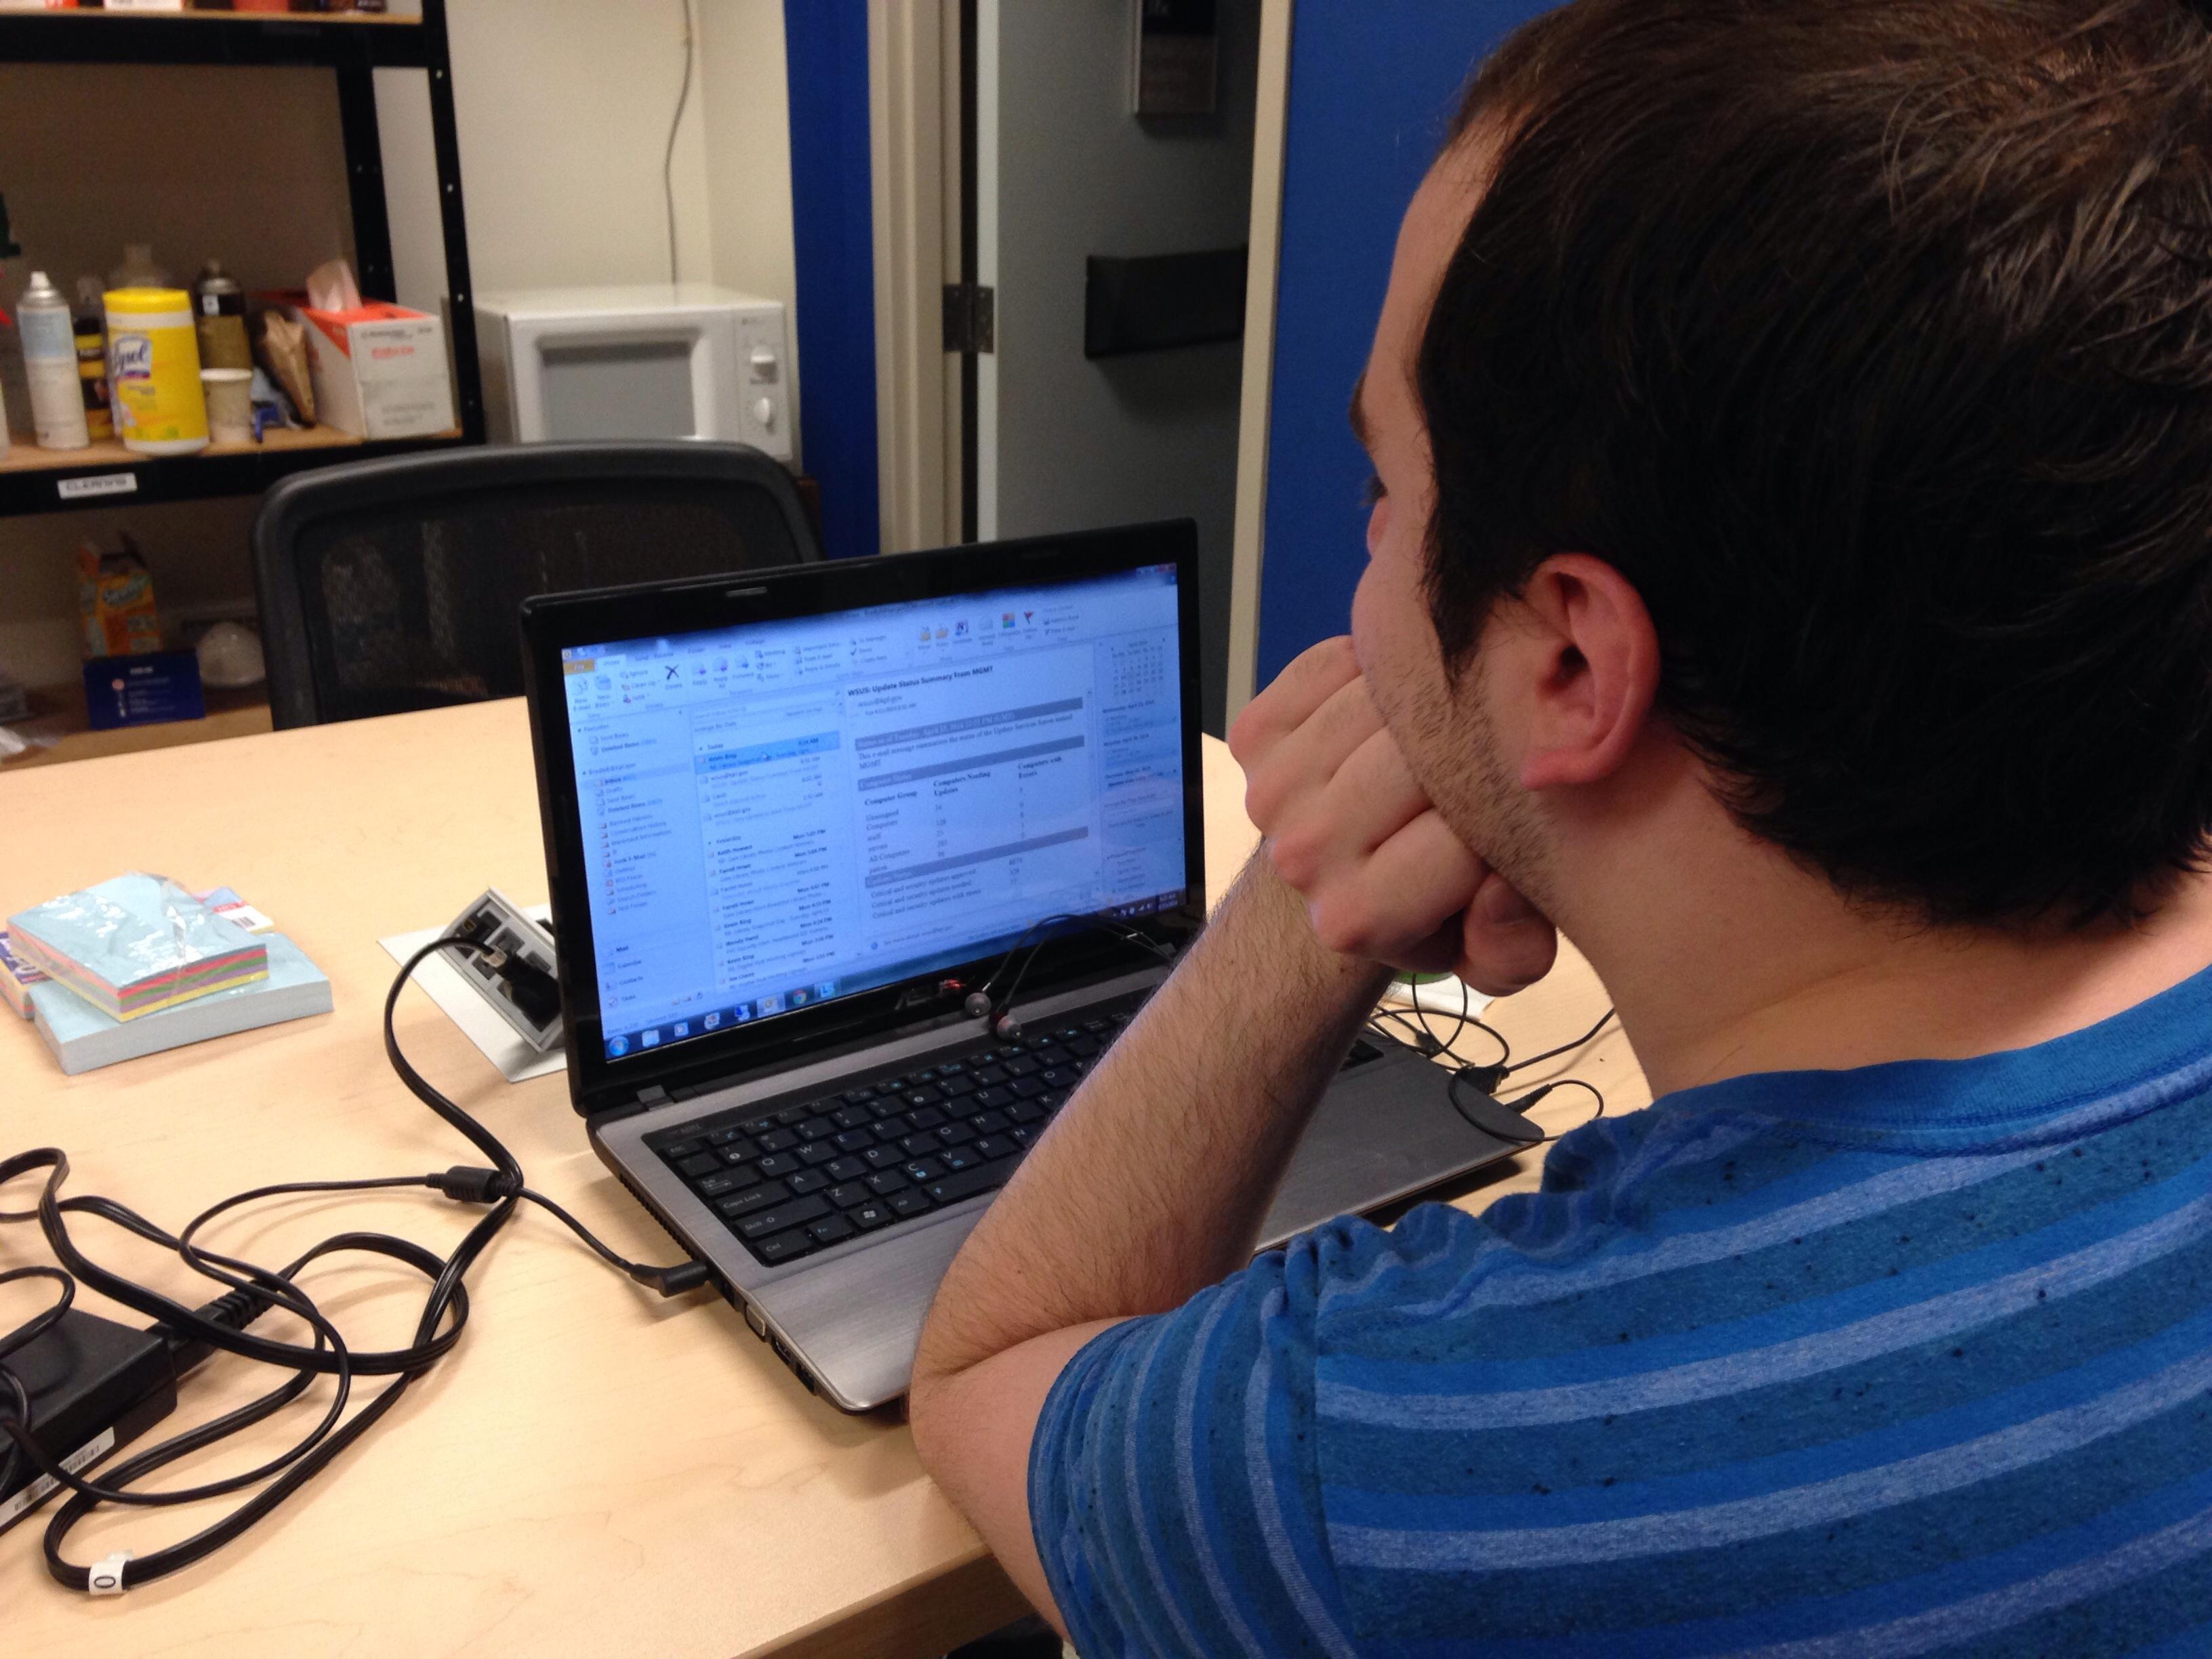 Hard working IT intern. #KPLsnapshot